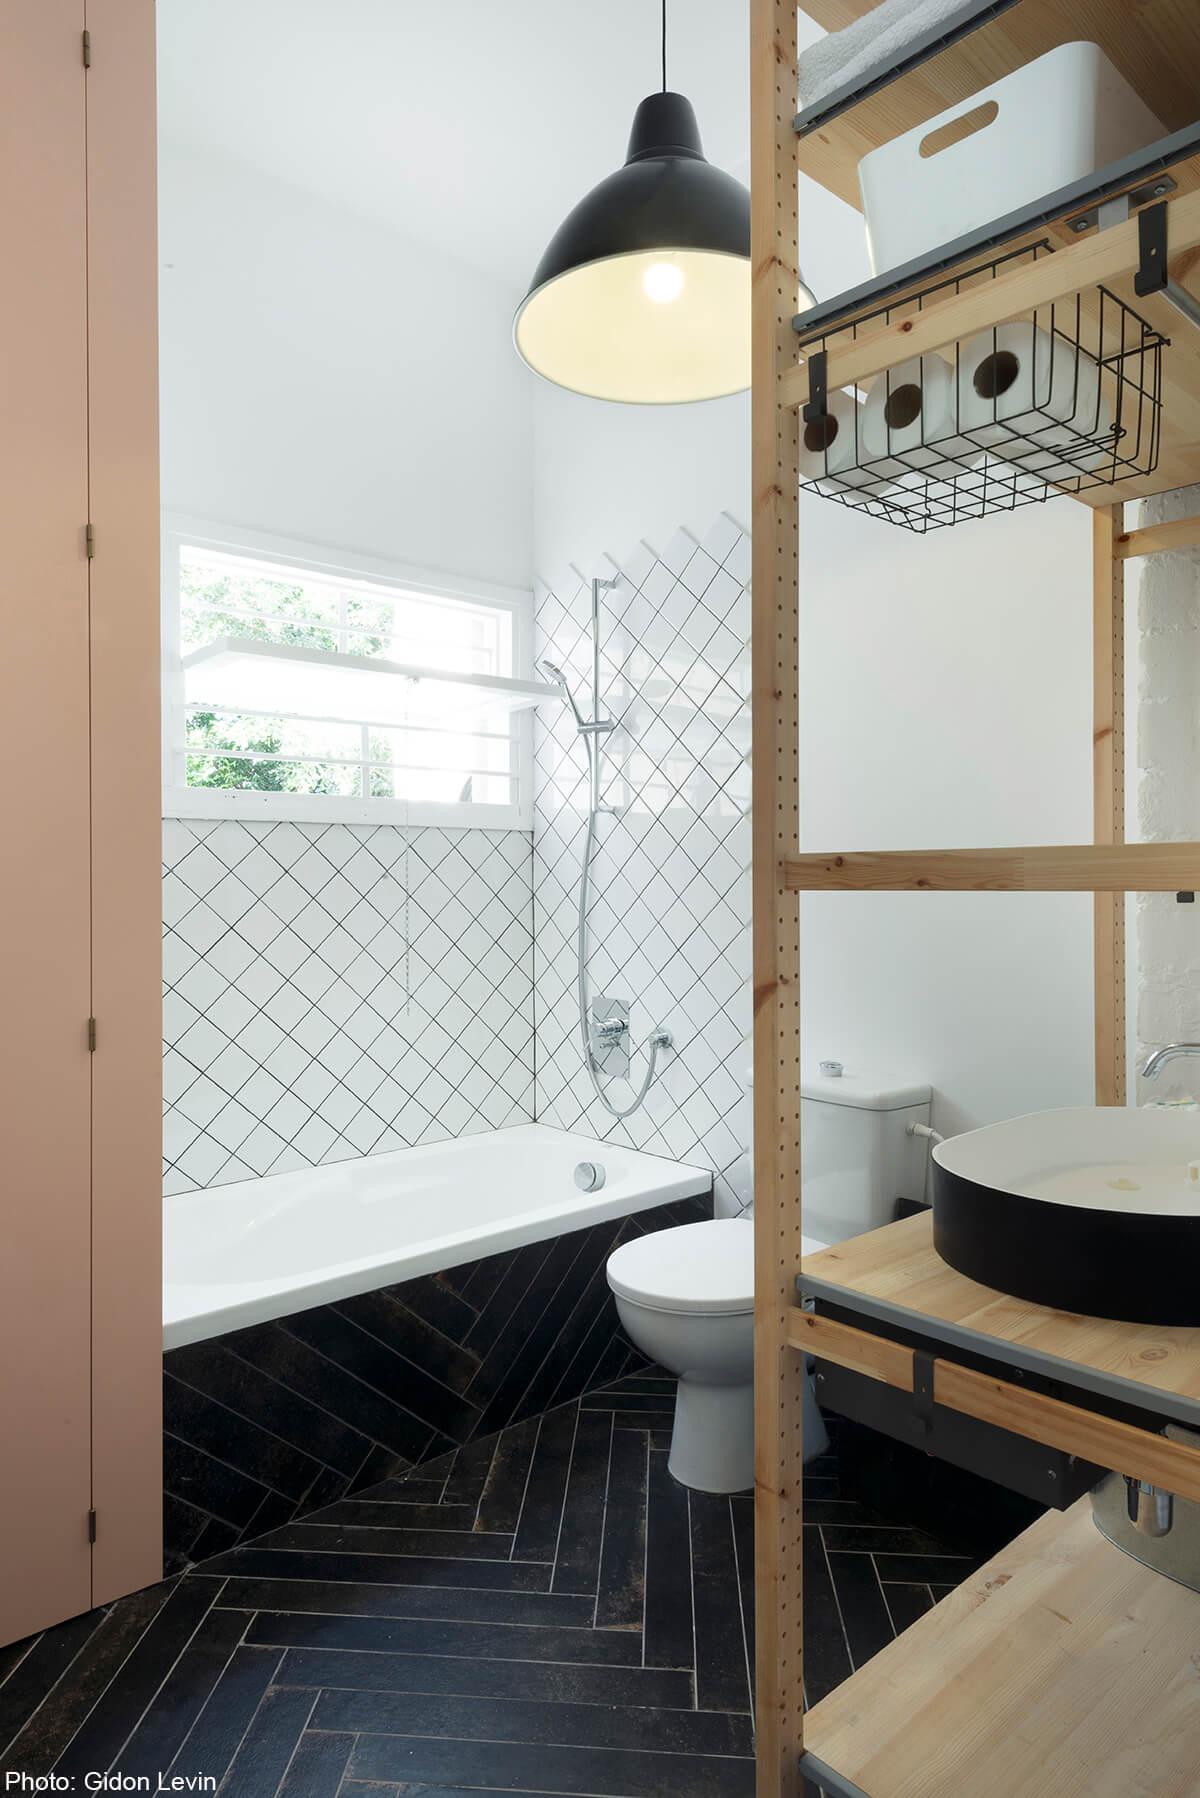 Bathroom in 100sqm apartment designed by Matka Studio